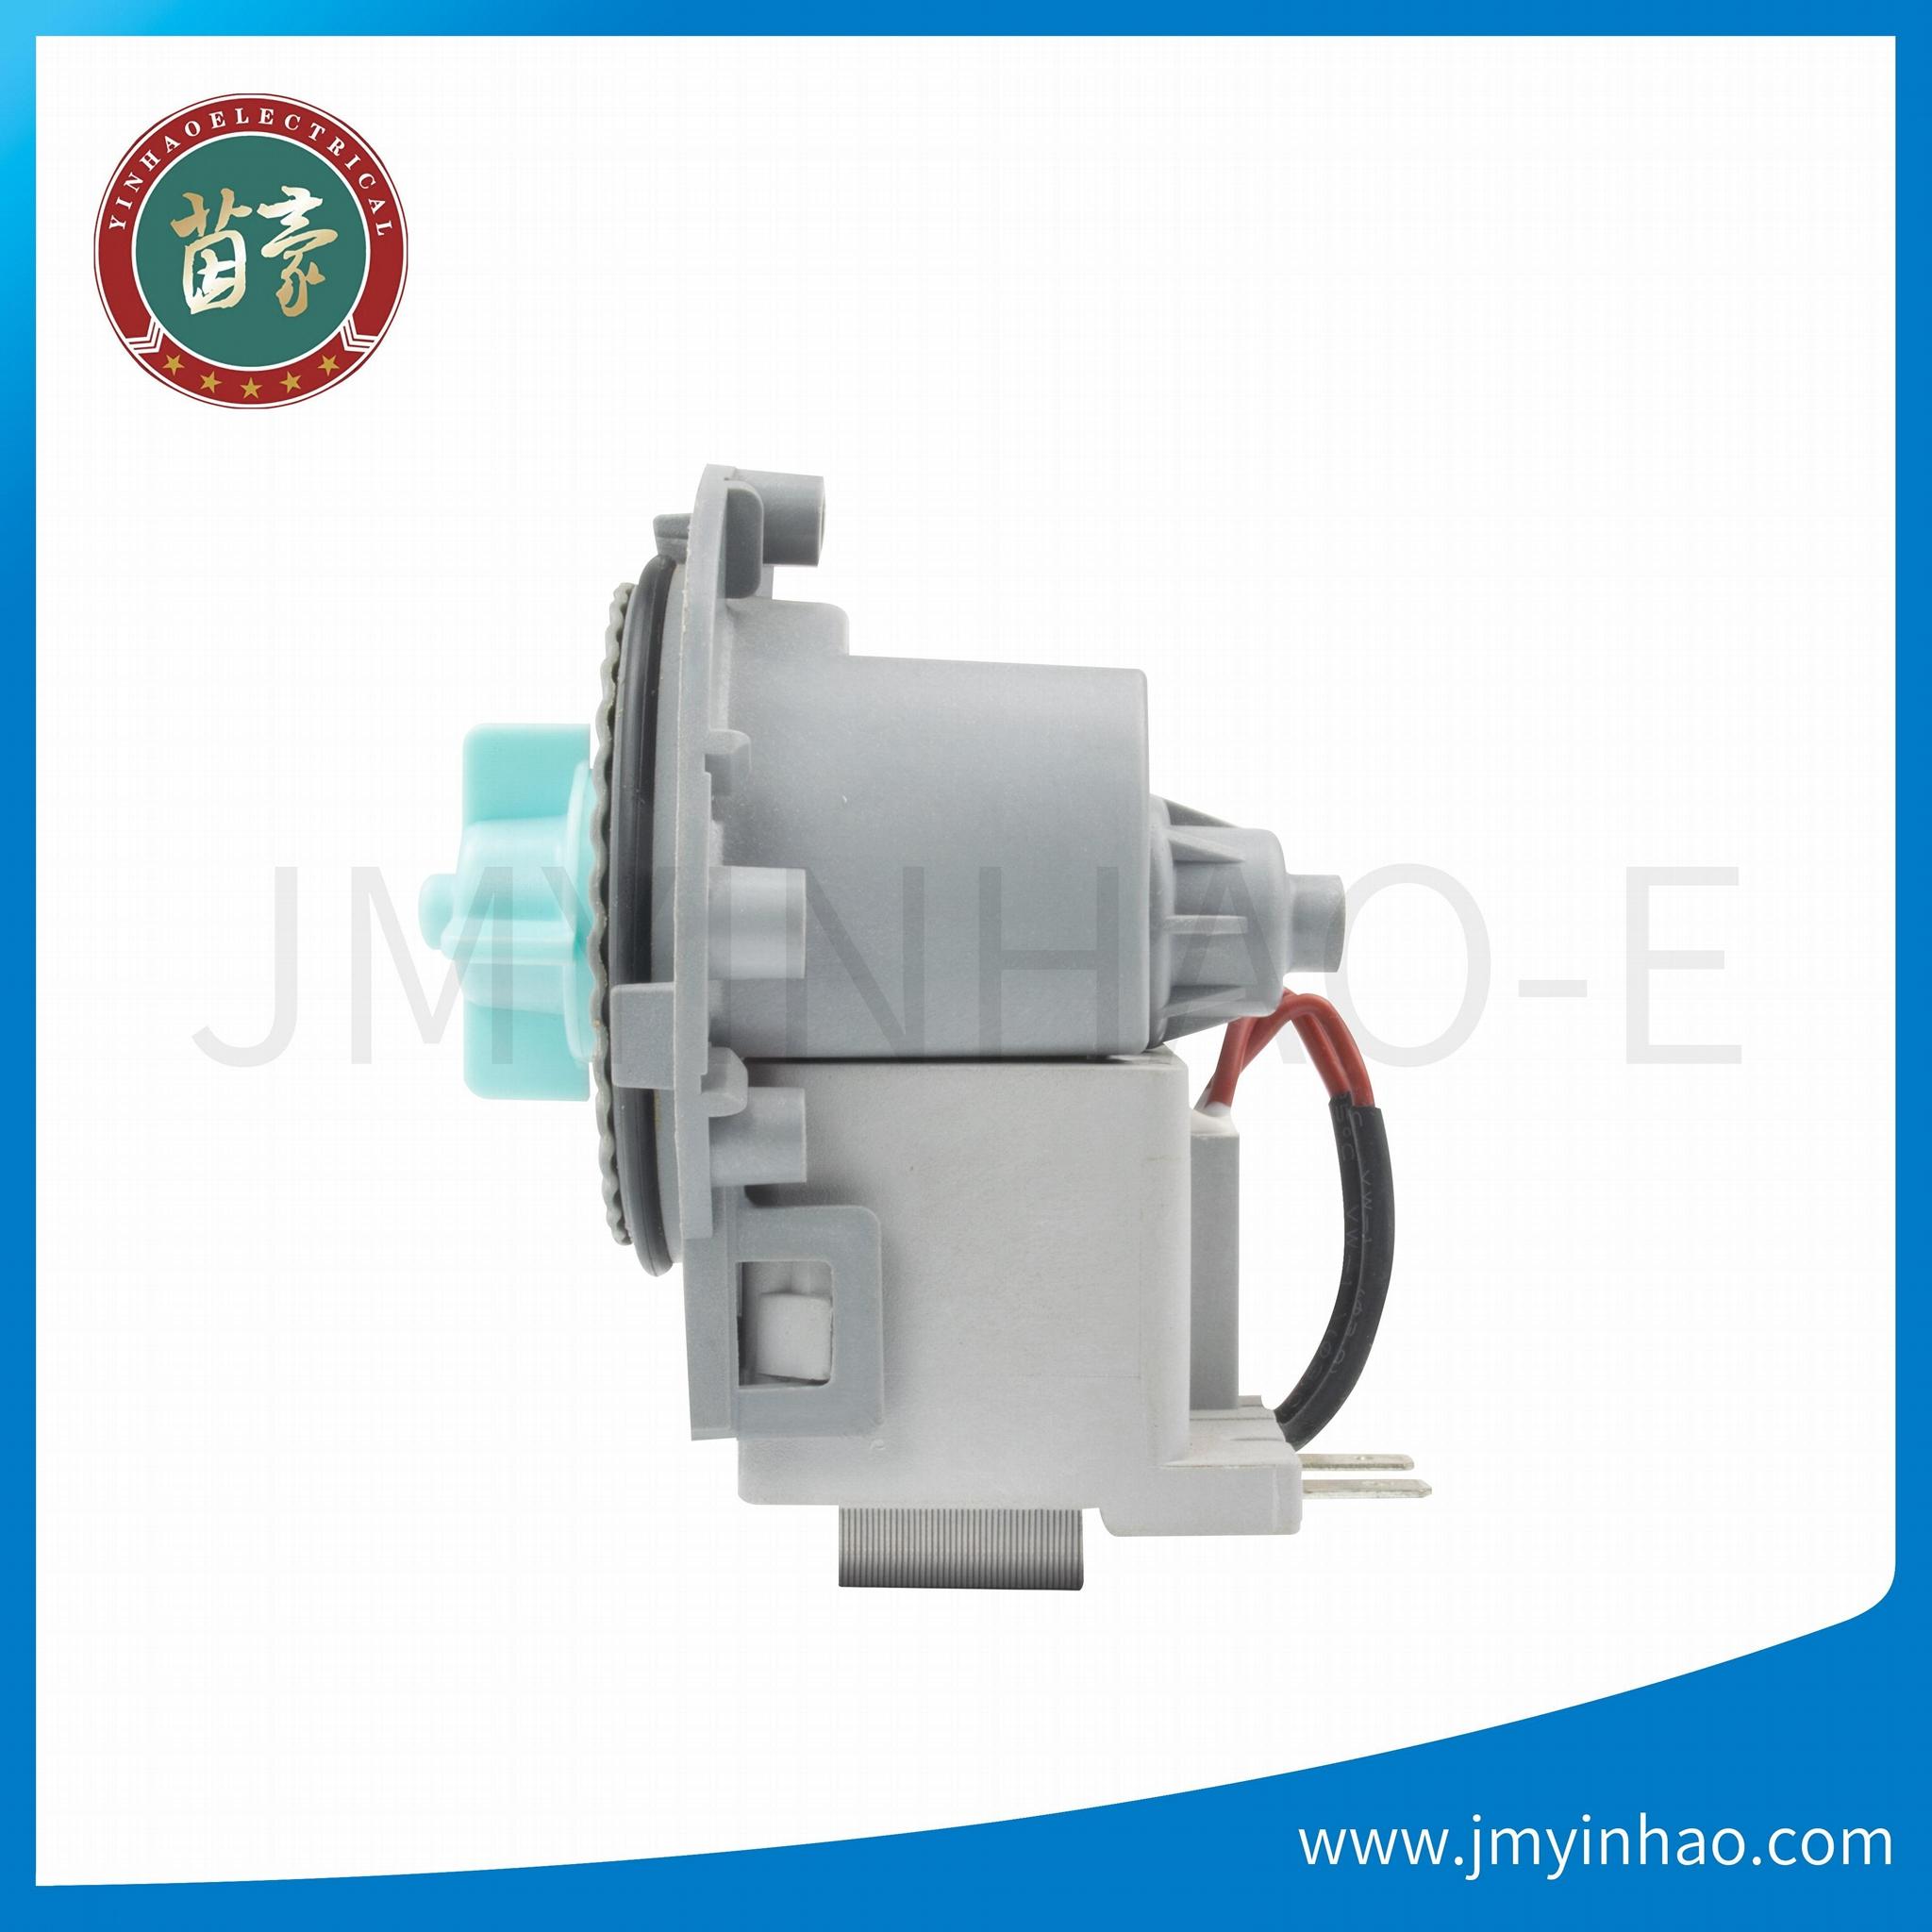 washing machine spare parts/drain pump motor 2